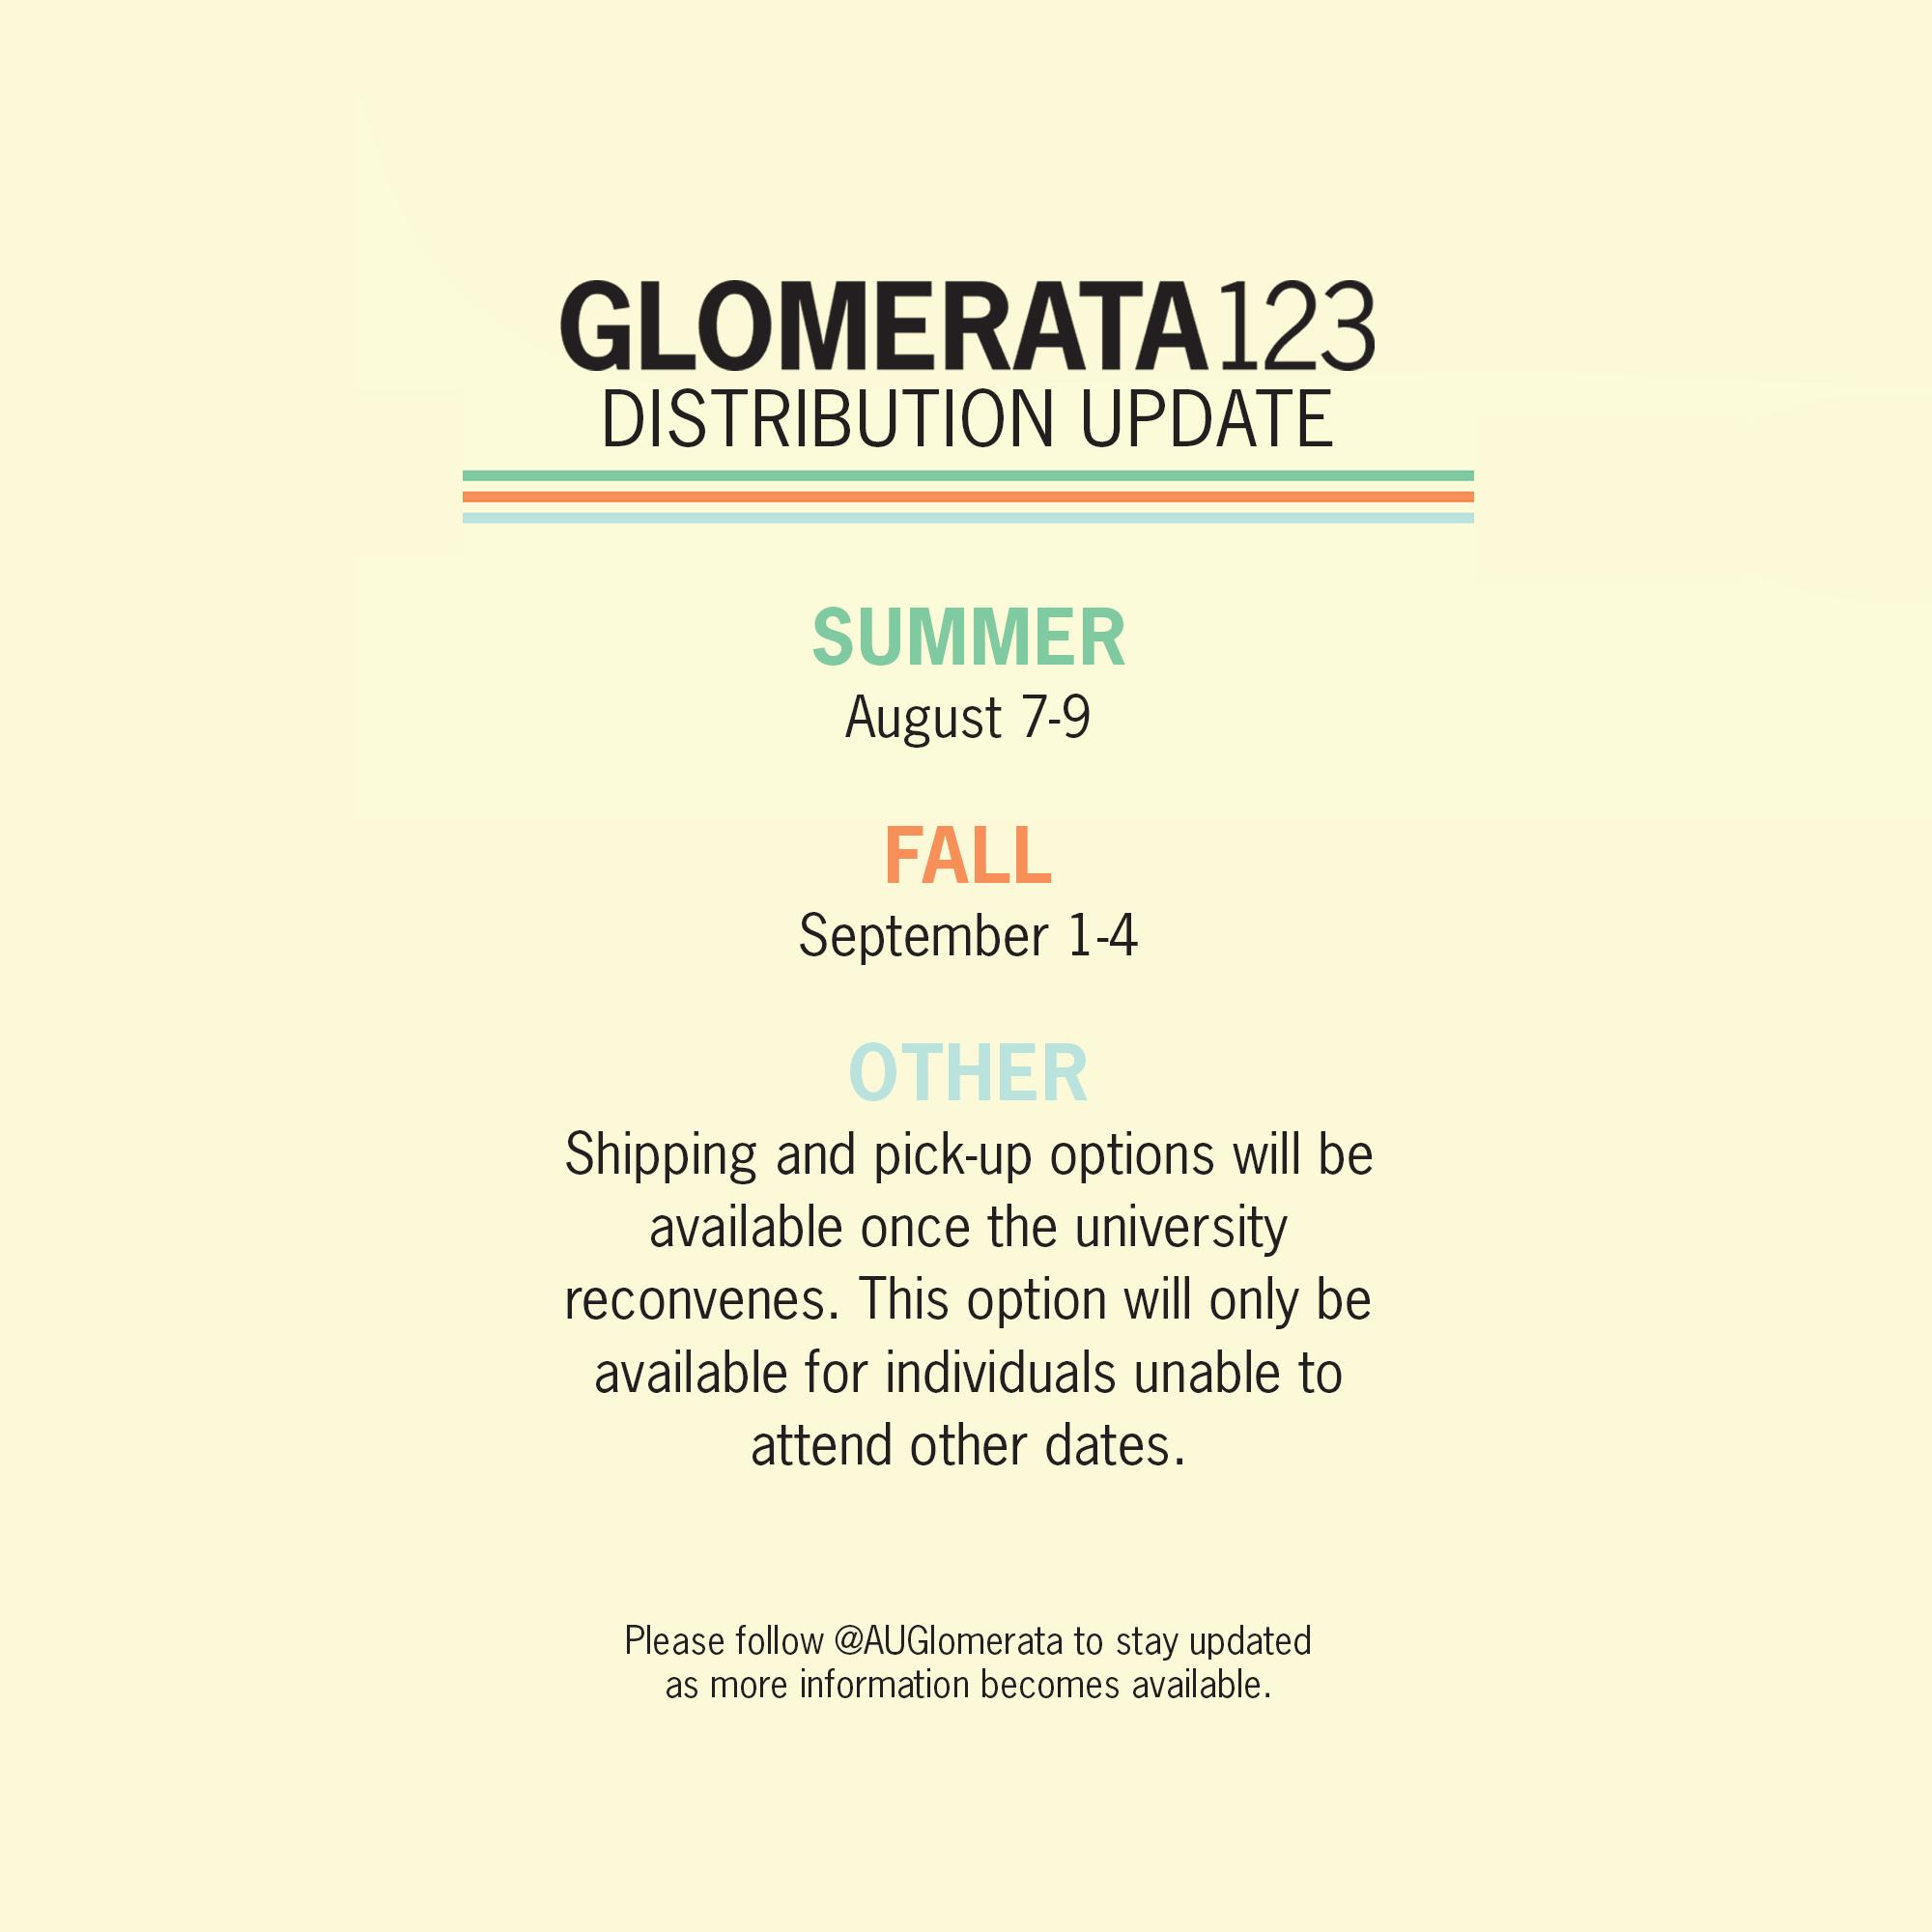 Glomerata123 Distribution Update